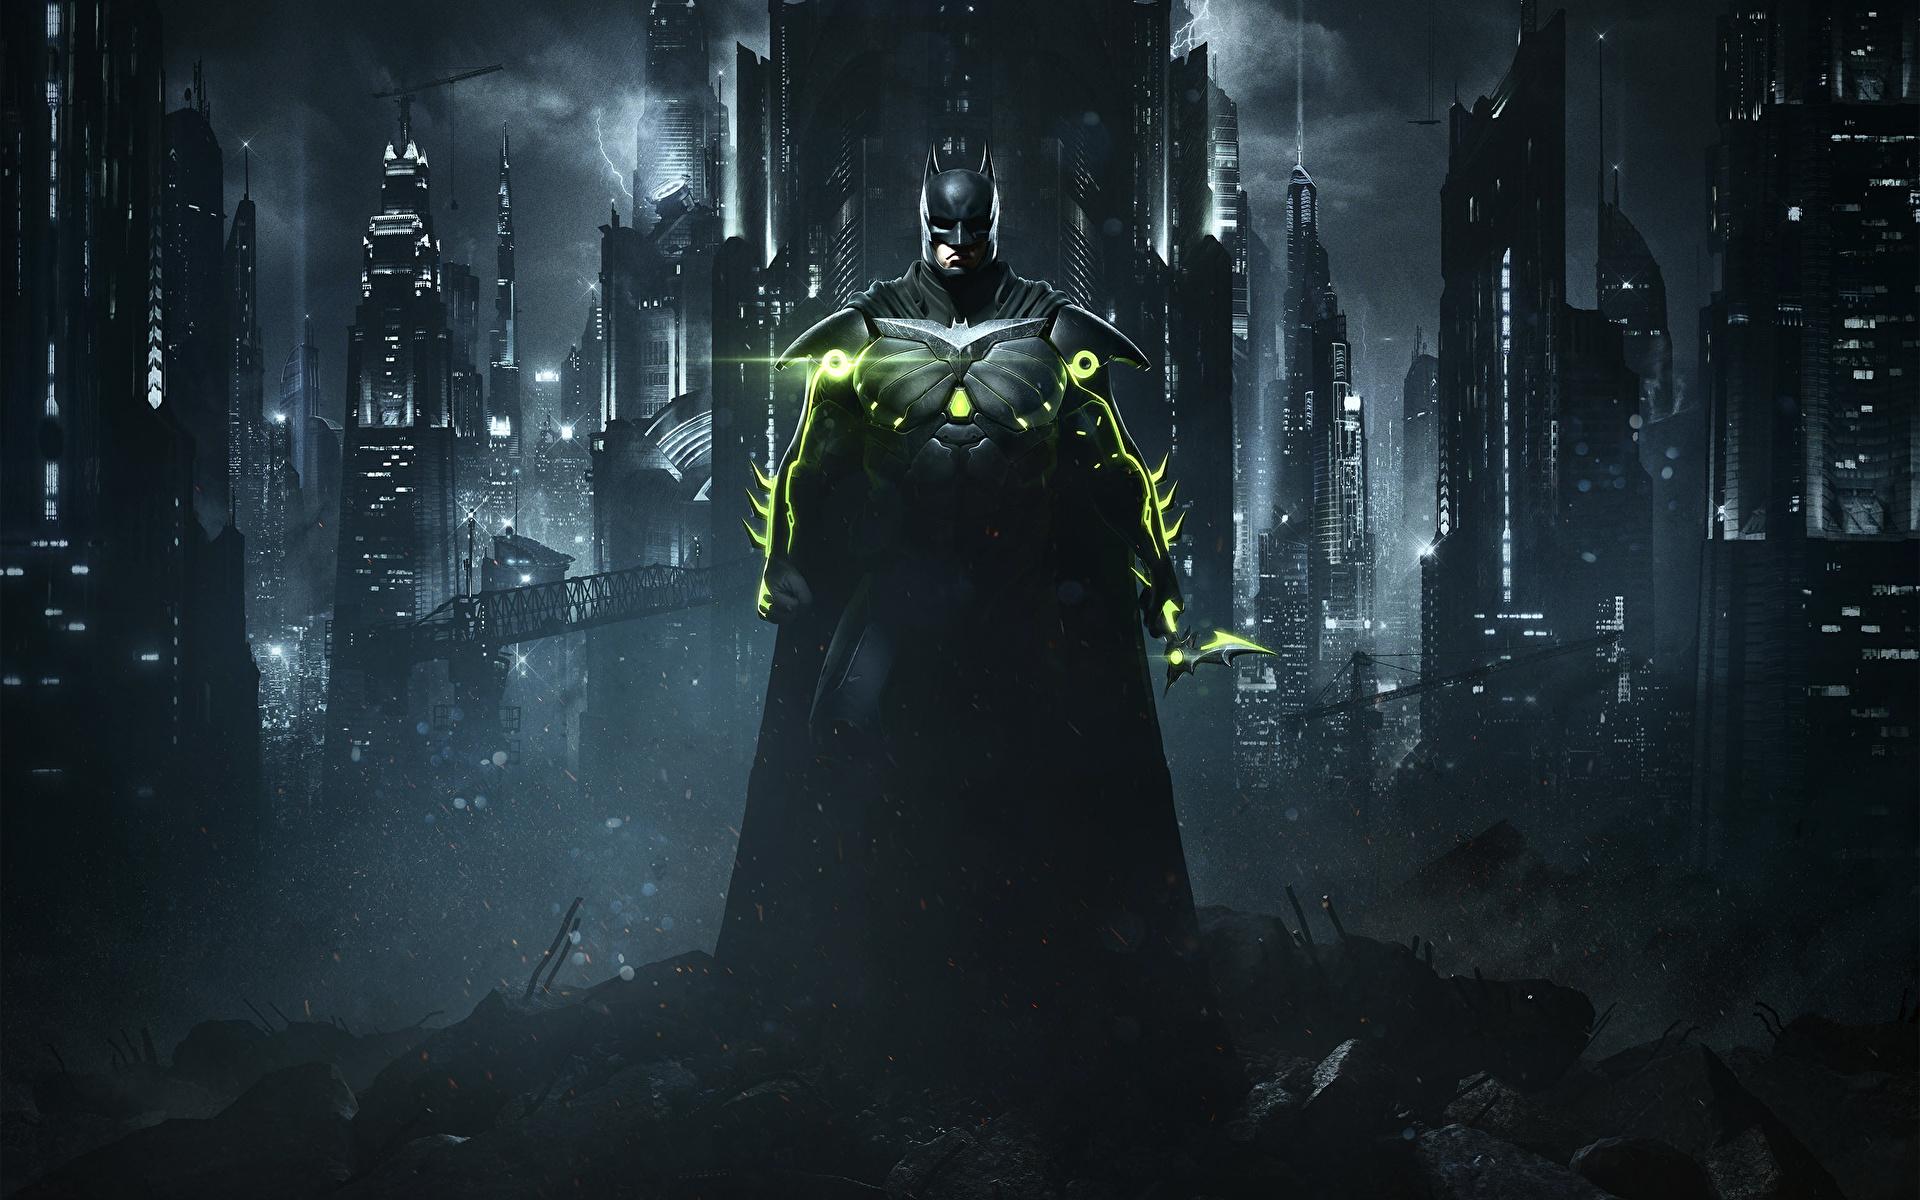 Image Injustice 2 Heroes comics Batman hero vdeo game Night 1920x1200 superheroes Games night time